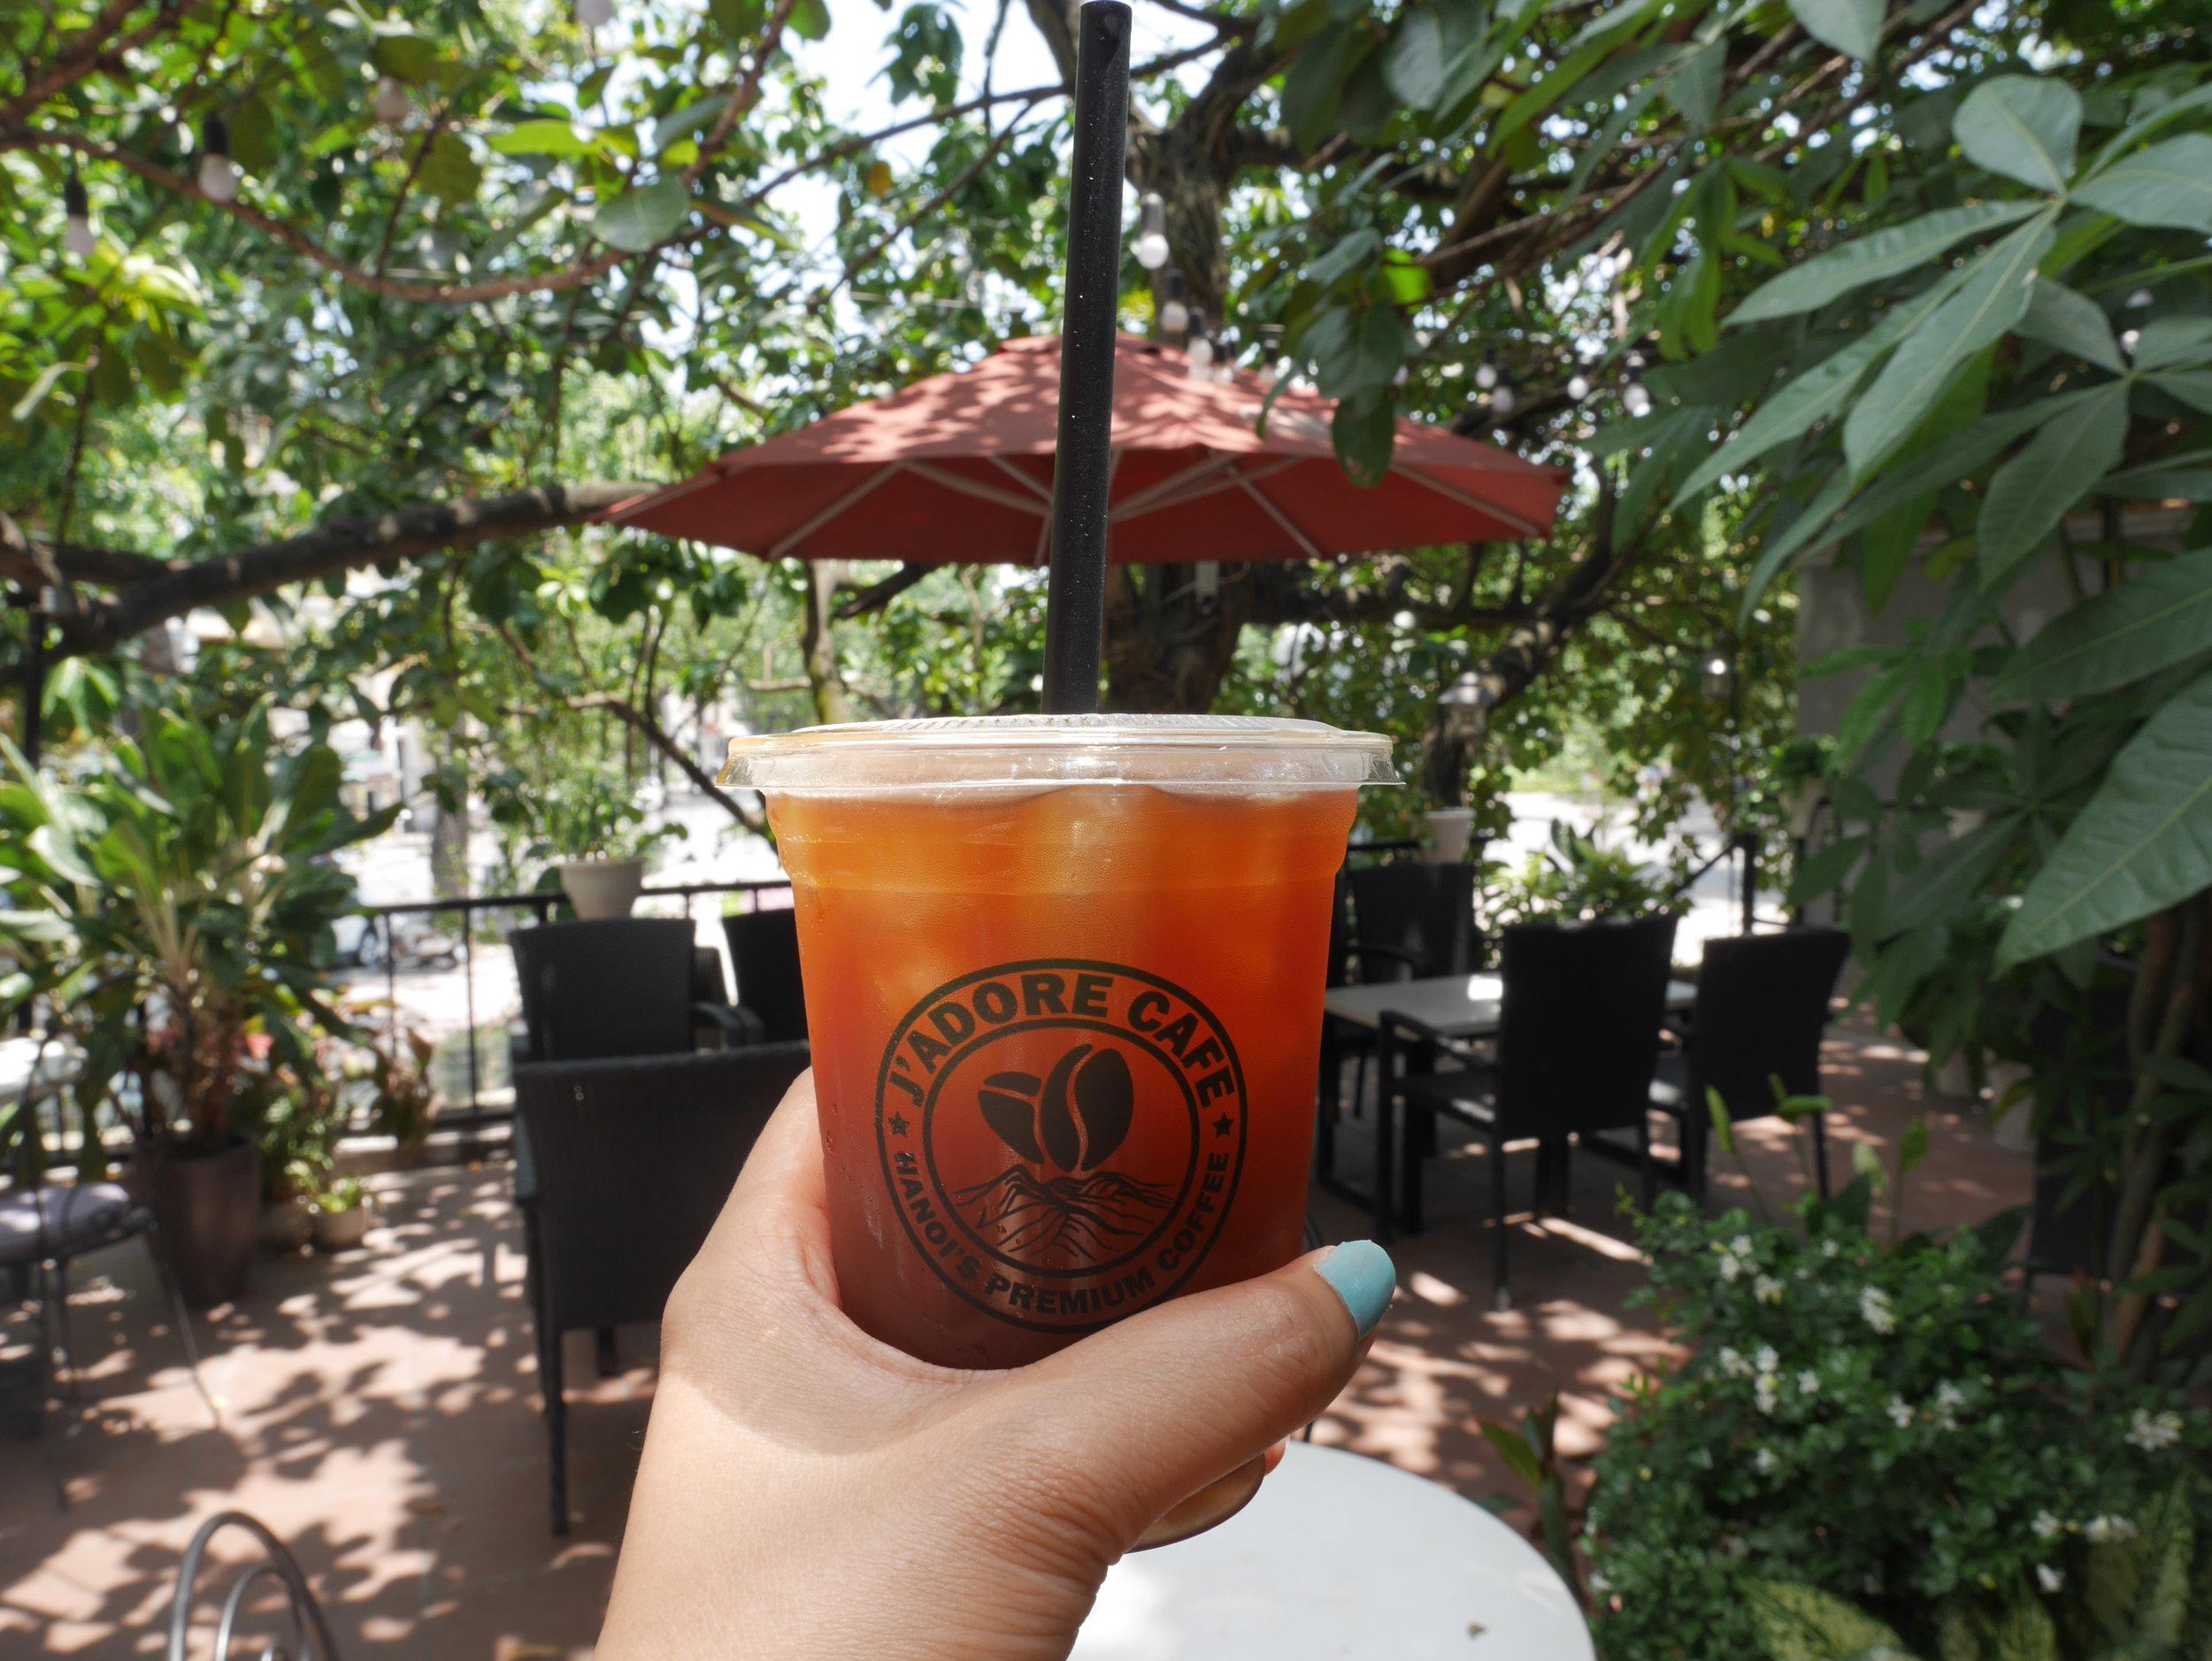 J;Adore cafe, Hanoi, Vietnam. Cafe around Hoan Kiem Lake